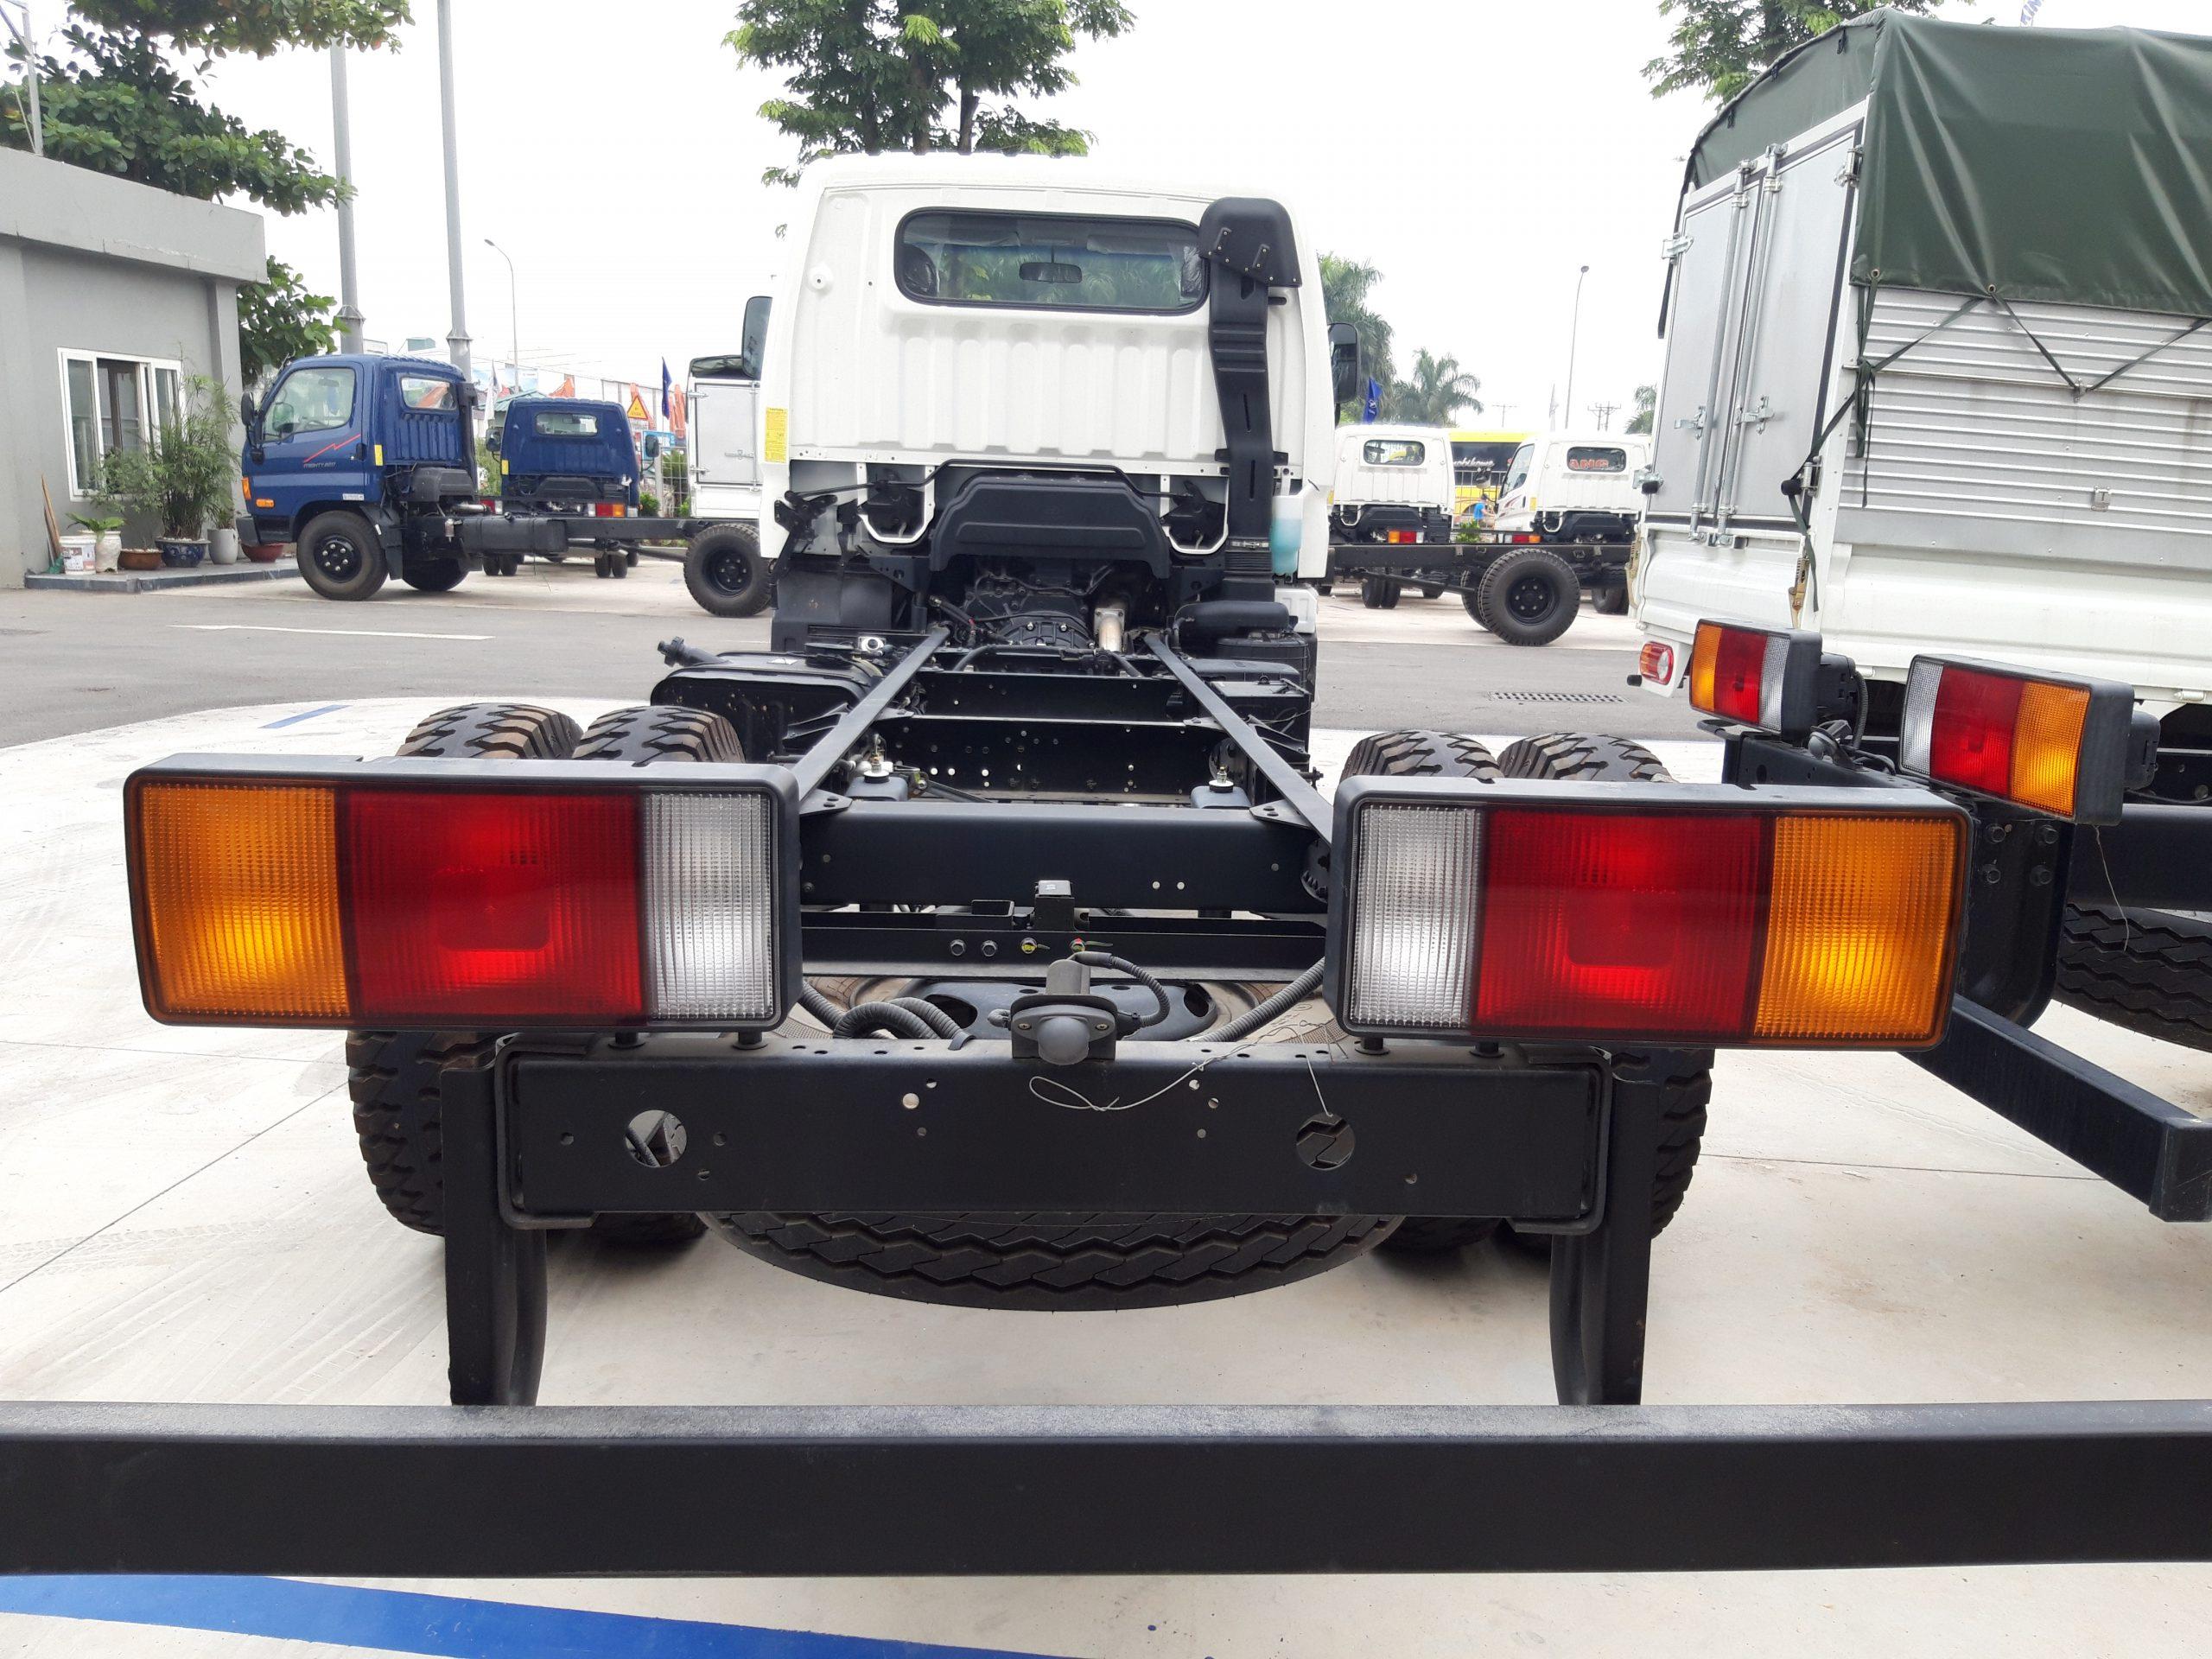 Ngoại Thất xe tải hyundai 110sp 7 tấn